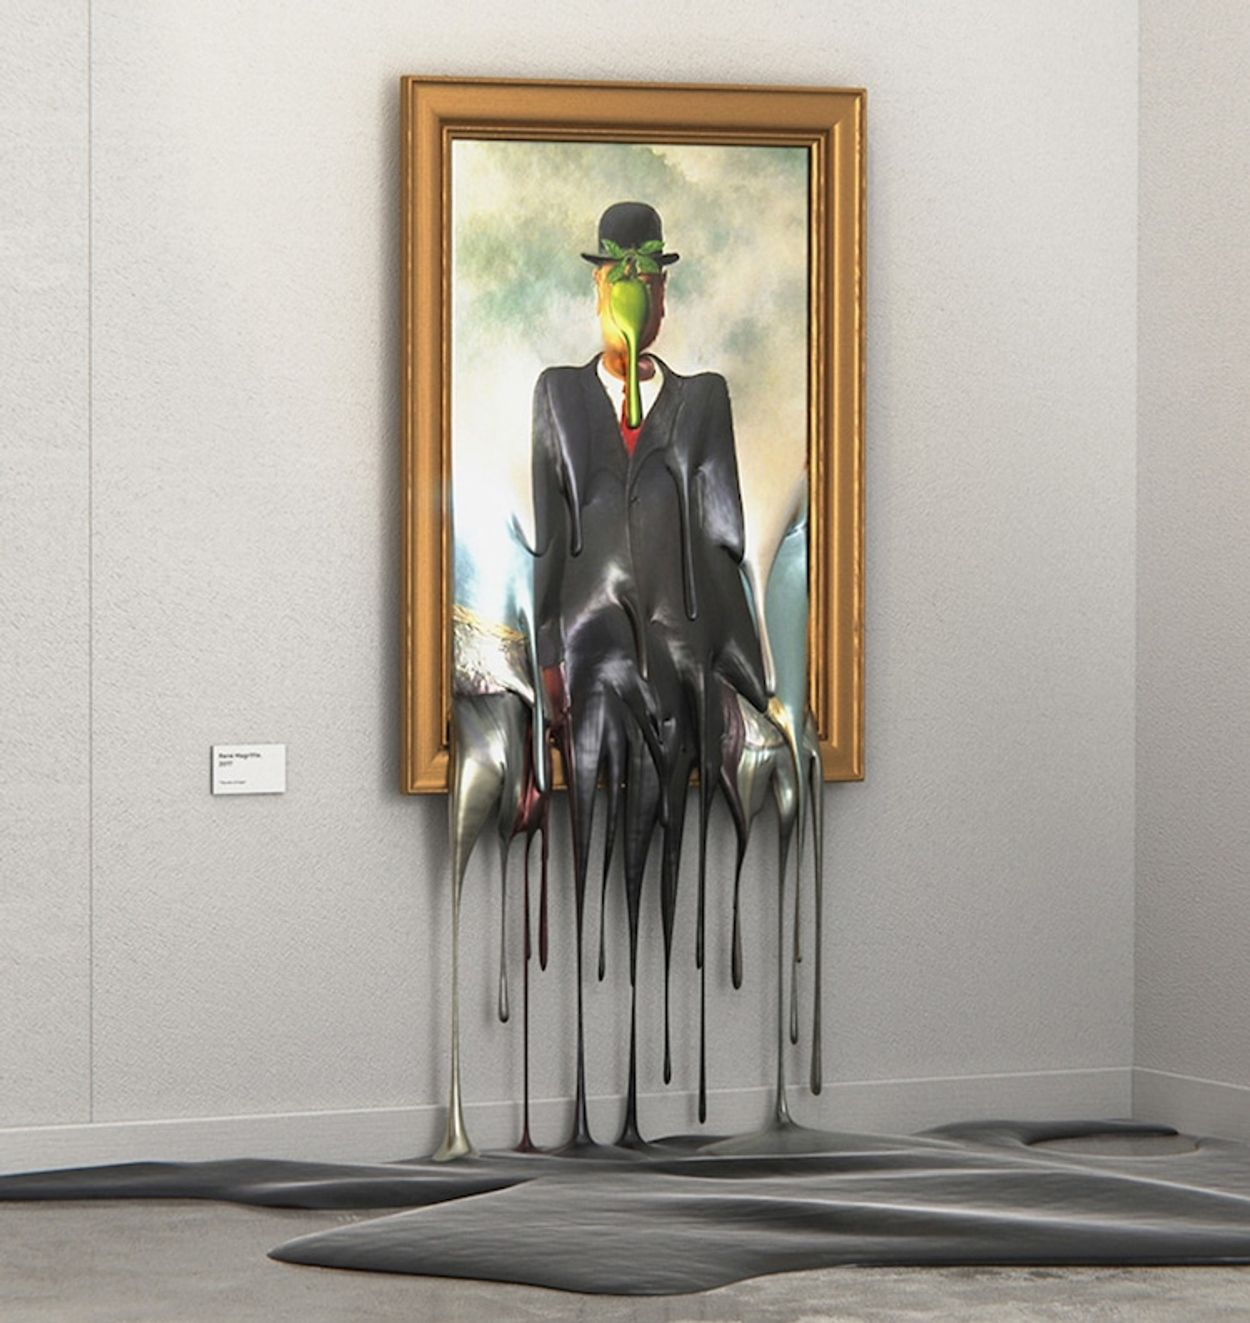 melting-masterpieces-digital-art-alper-dostal-4